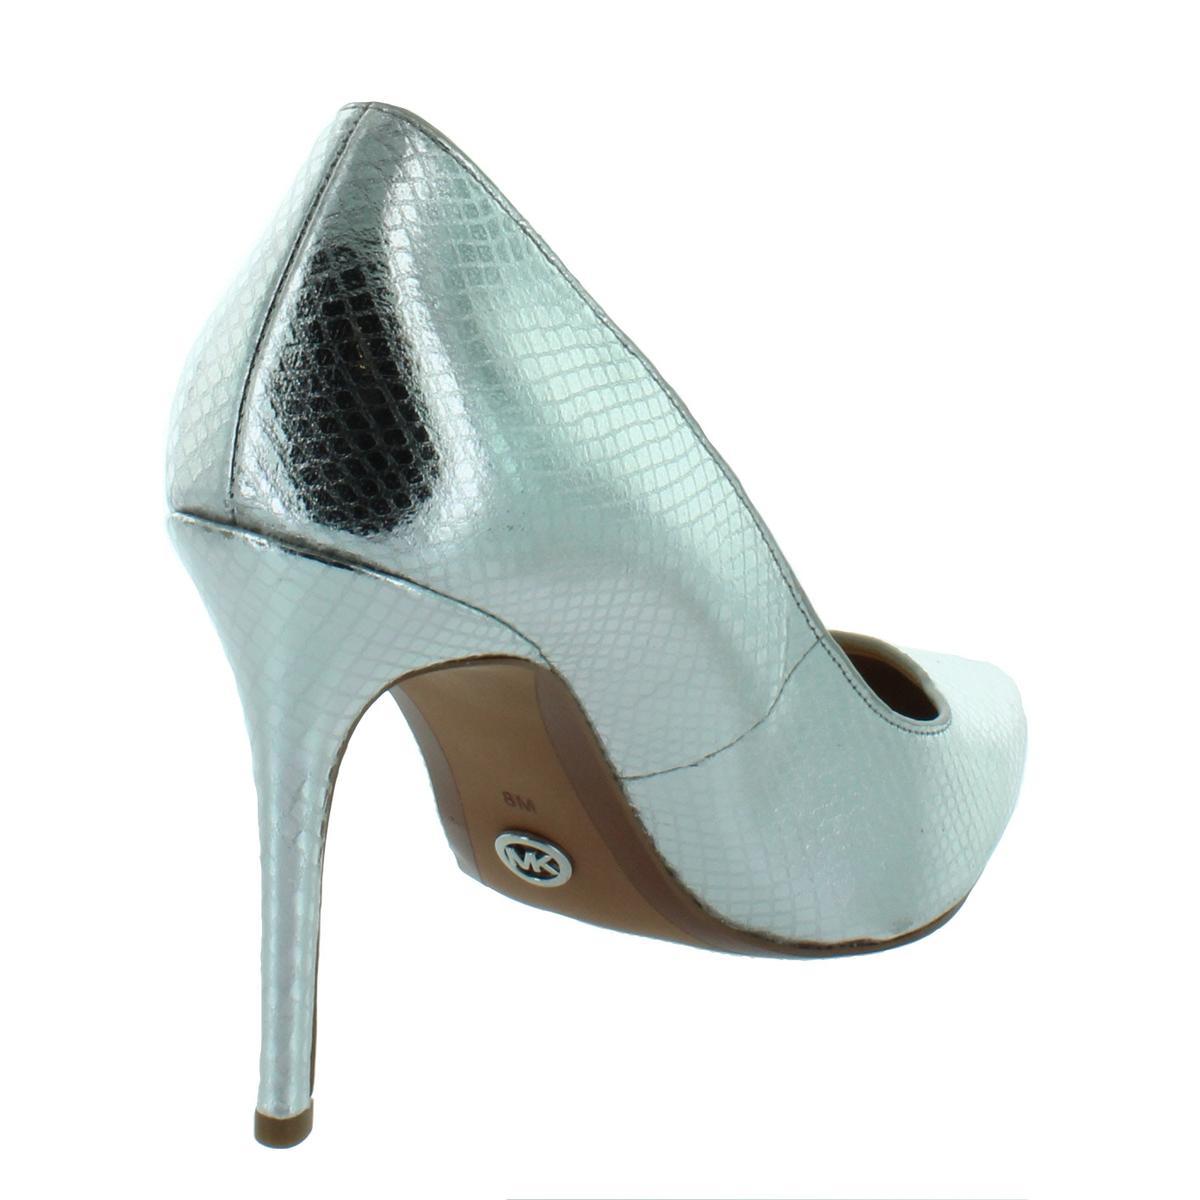 MICHAEL-Michael-Kors-Womens-Claire-Leather-Dress-Heels-Shoes-BHFO-5919 thumbnail 6